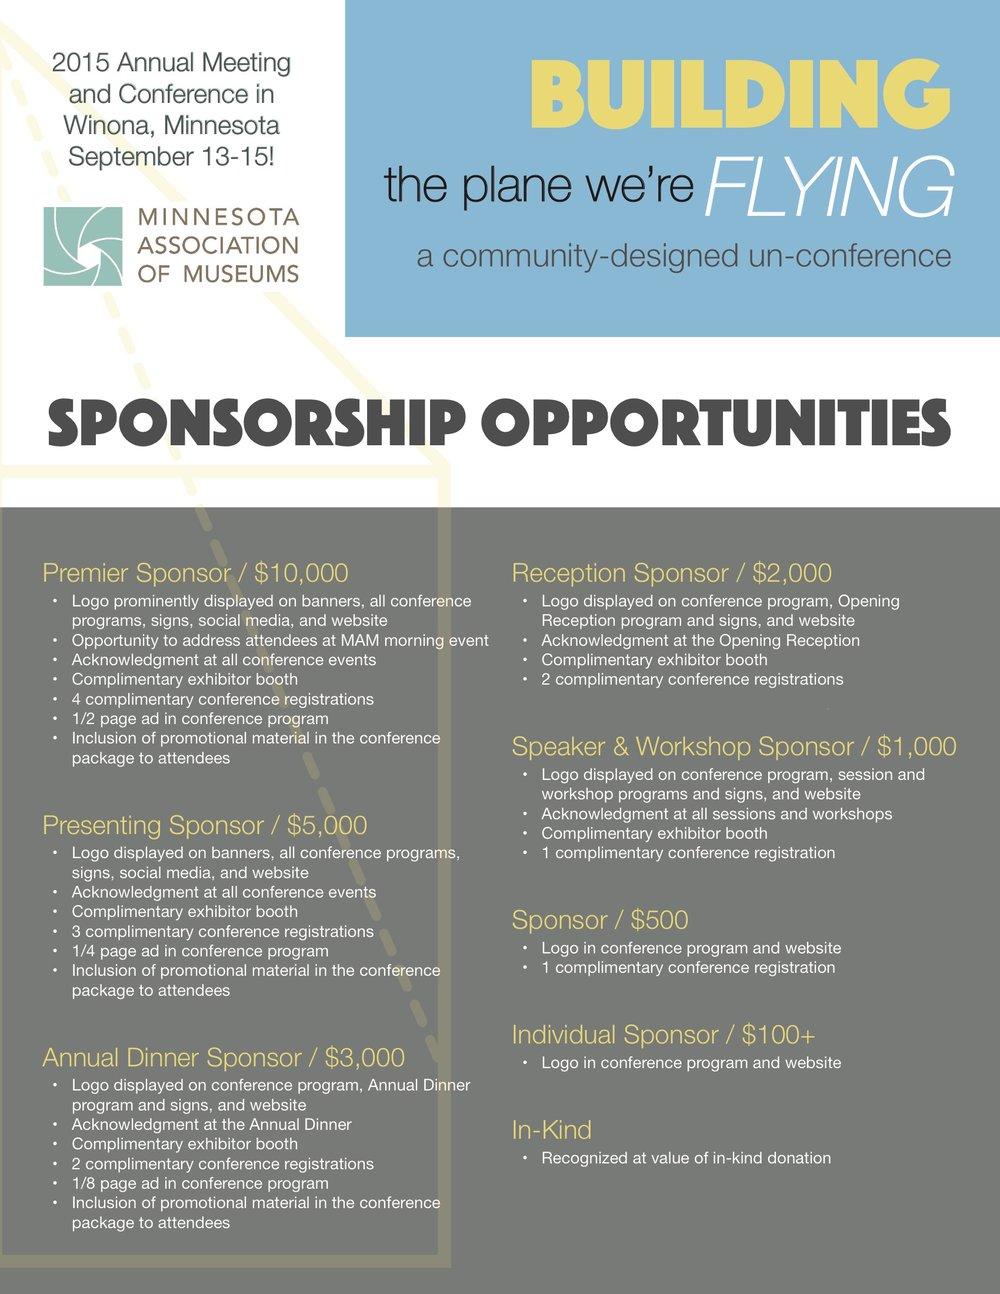 2015 MAM Ad & Sponsorship Opportunities 1.jpeg